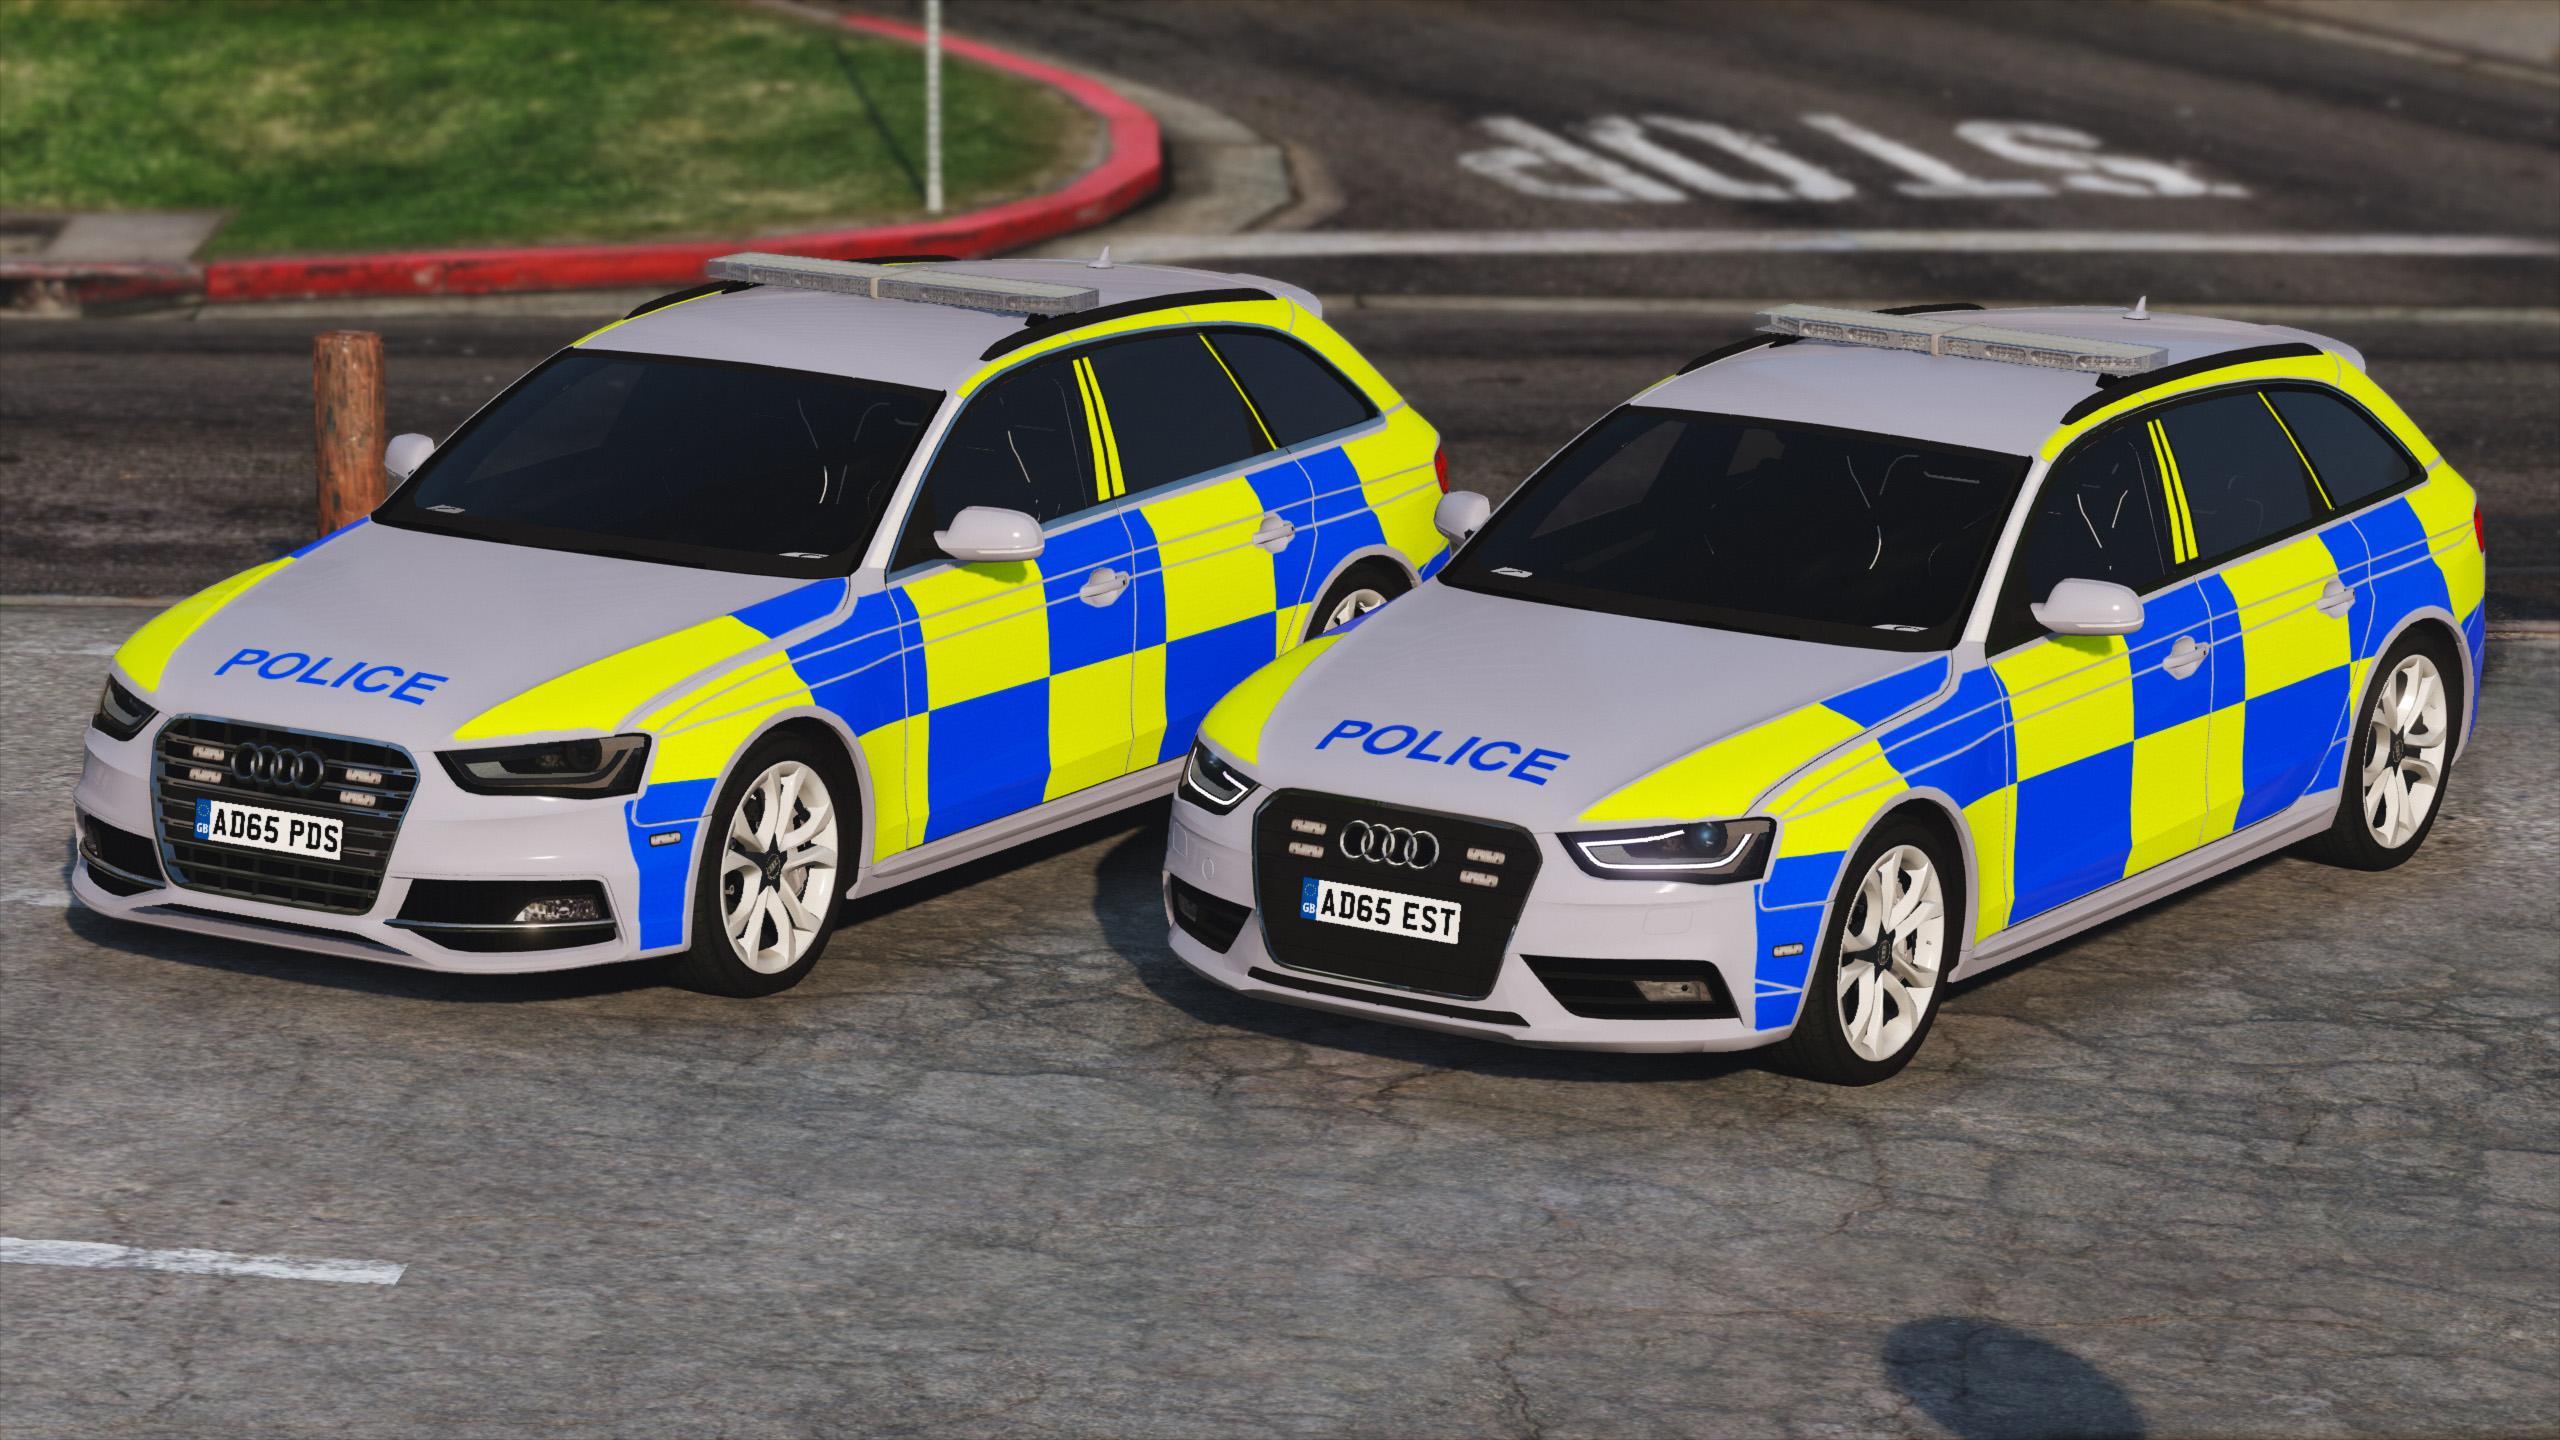 2013 British Police Audi A4/S4 Avant - GTA5-Mods com